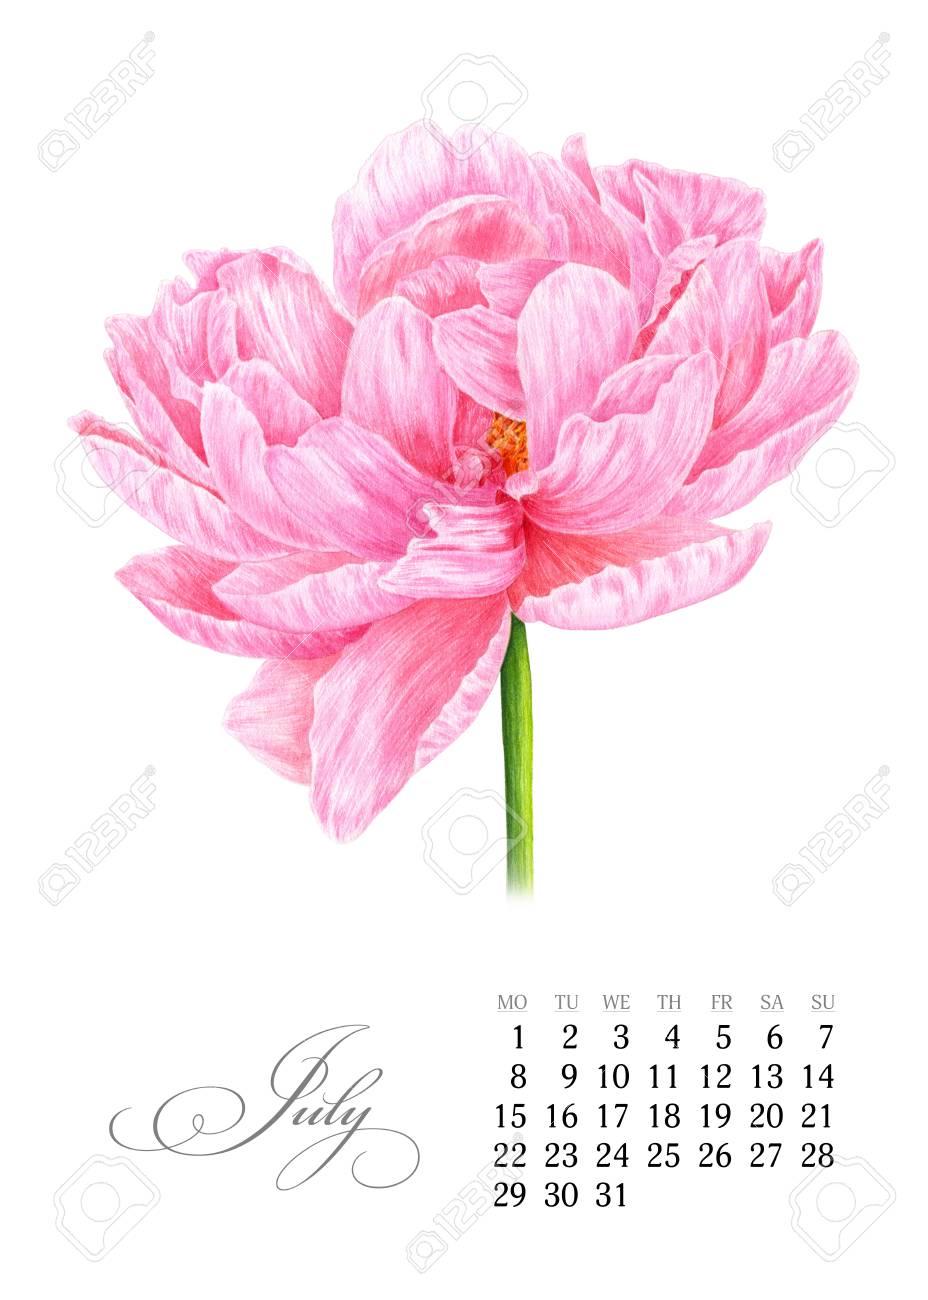 Elegant Printable Calendar 2019 July Watercolor Pink Peony